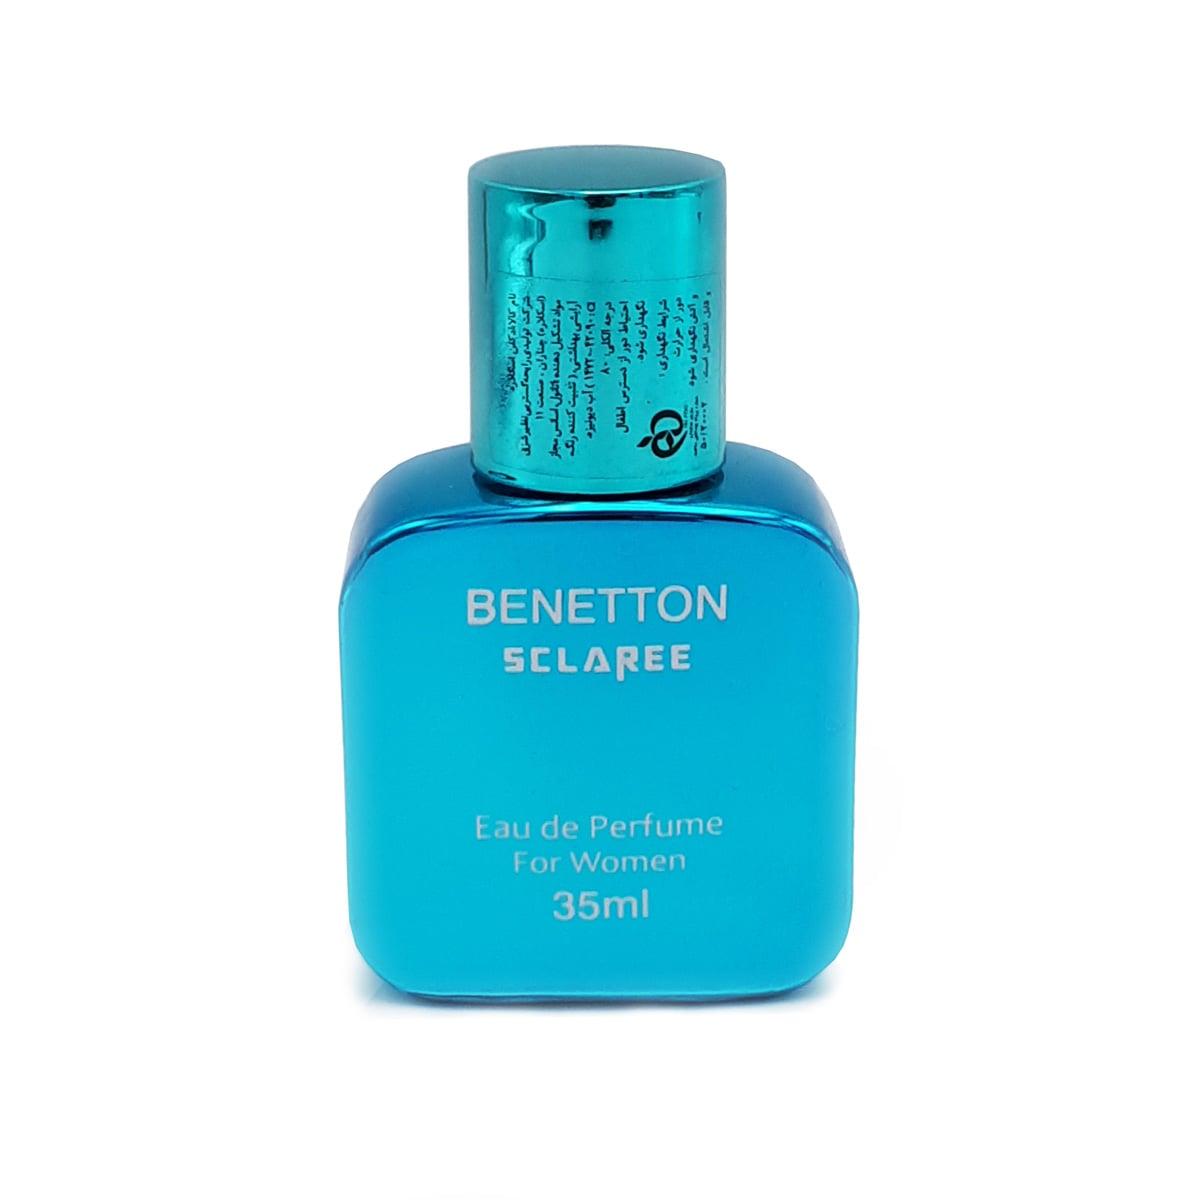 عطر جیبی مردانه اسکلاره مدل BENETON حجم ۳۵ میلی لیتر